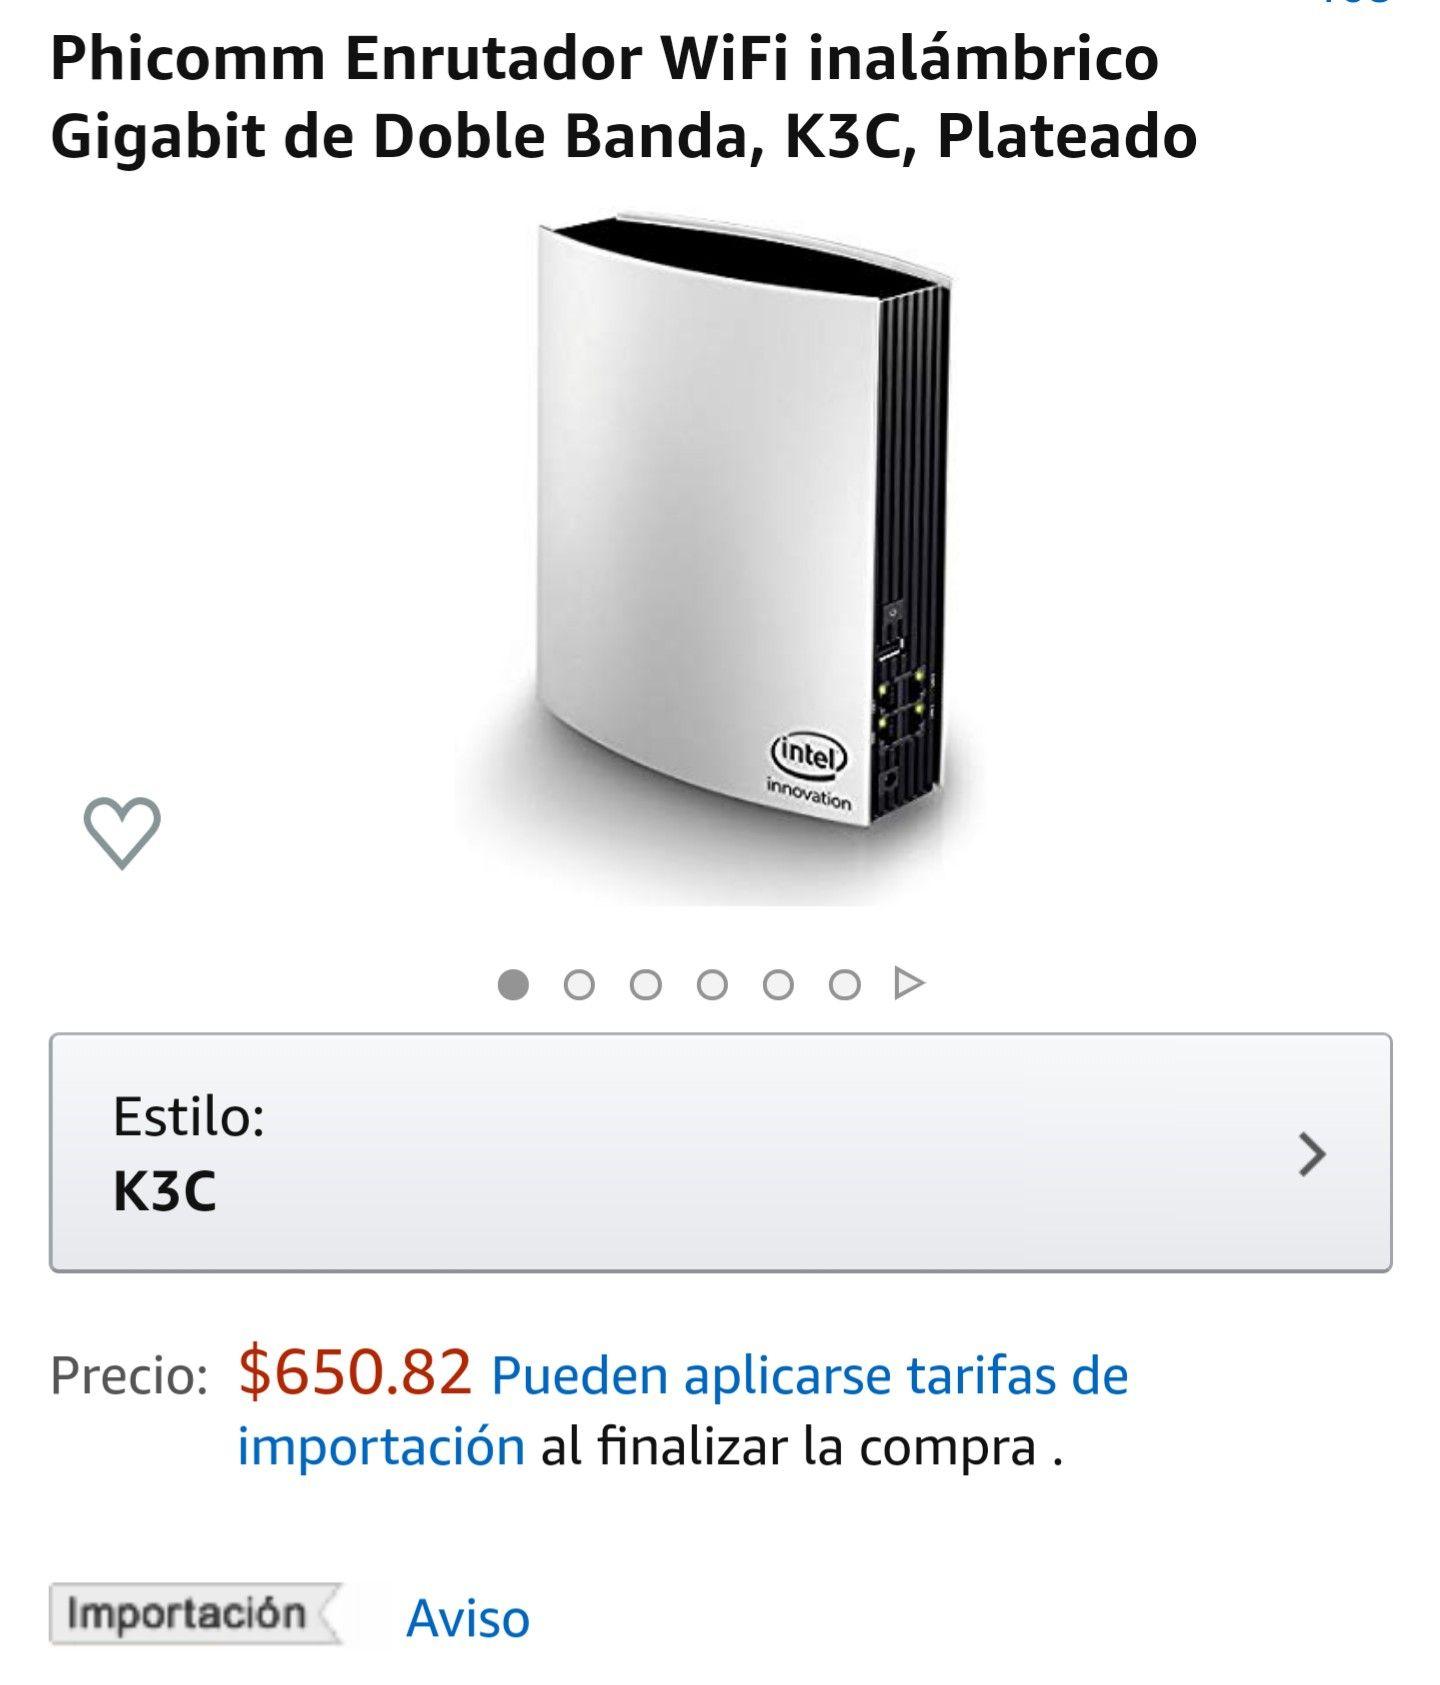 Amazon: Phicomm Enrutador WiFi inalámbrico Gigabit de Doble Banda, K3C